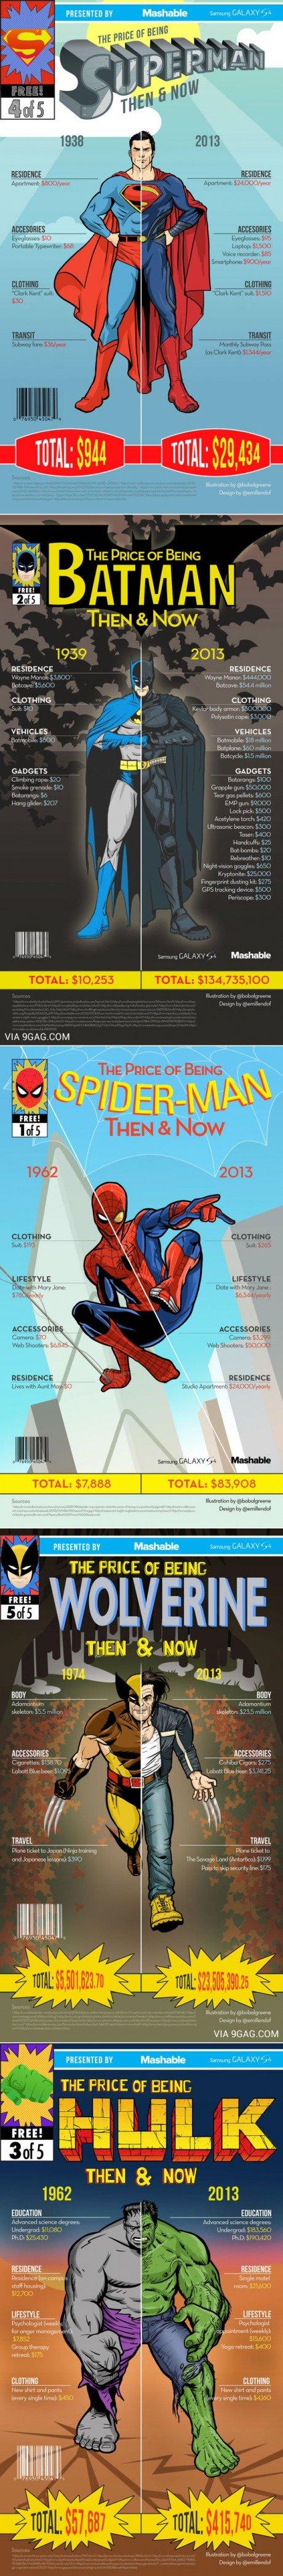 "Superhero spendings then/now. . w% littled? ittl! if THE PRICE OF BEING iih m"" THEN a tski/ st 1939 RESIDENCE 2013 H_ ENID_ AHCE V% ytte MEI! typr: i. uty. y wi superheros"